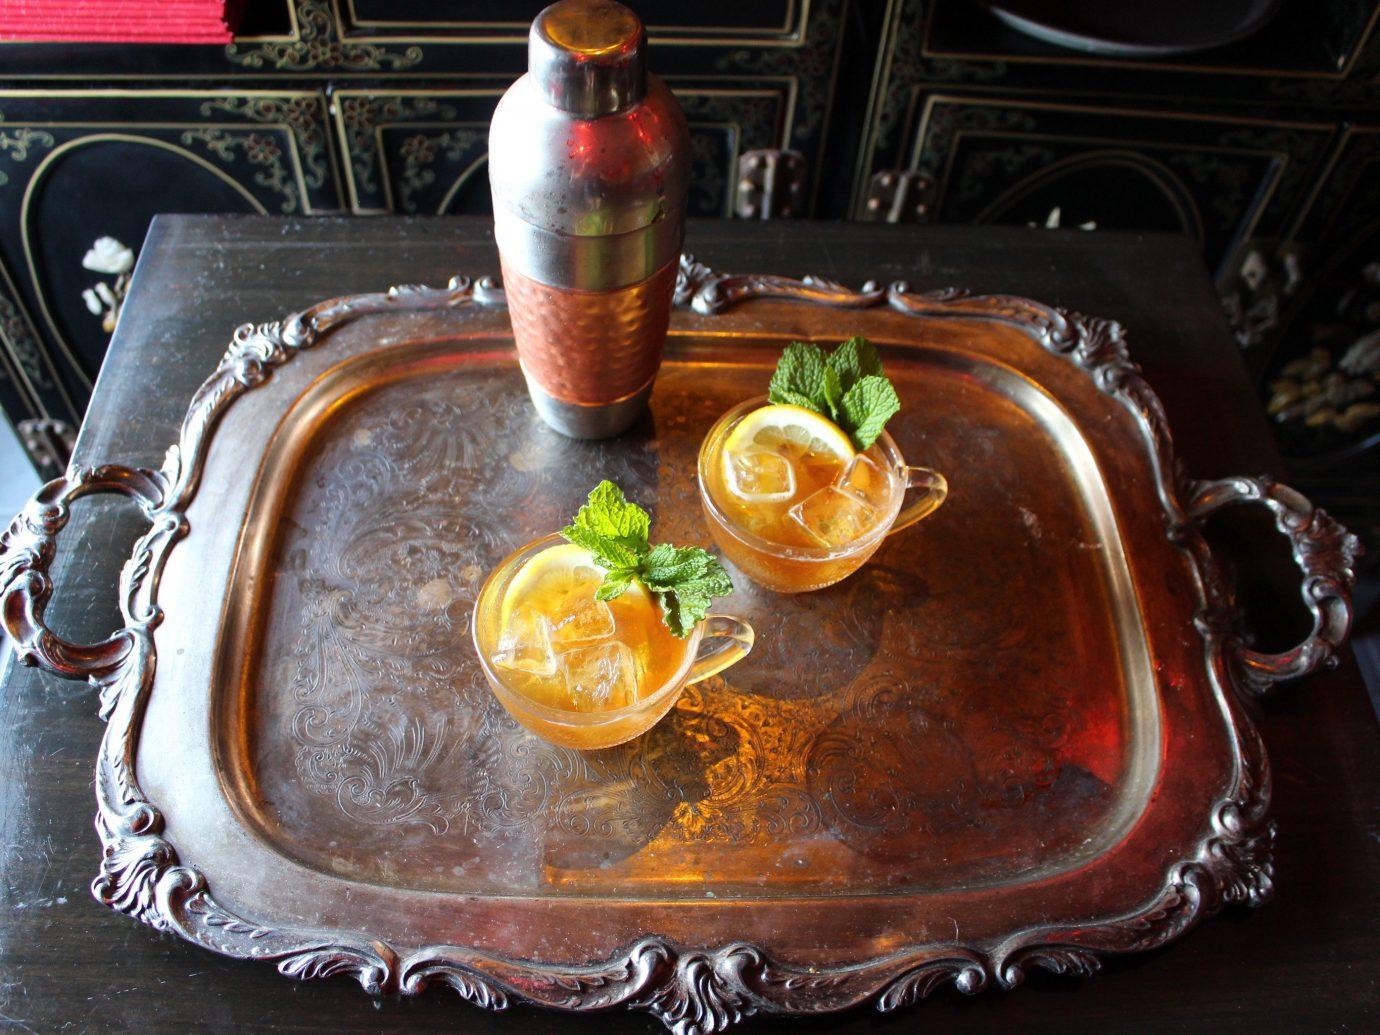 Trip Ideas indoor dish food meal dinner cuisine sense restaurant produce Drink